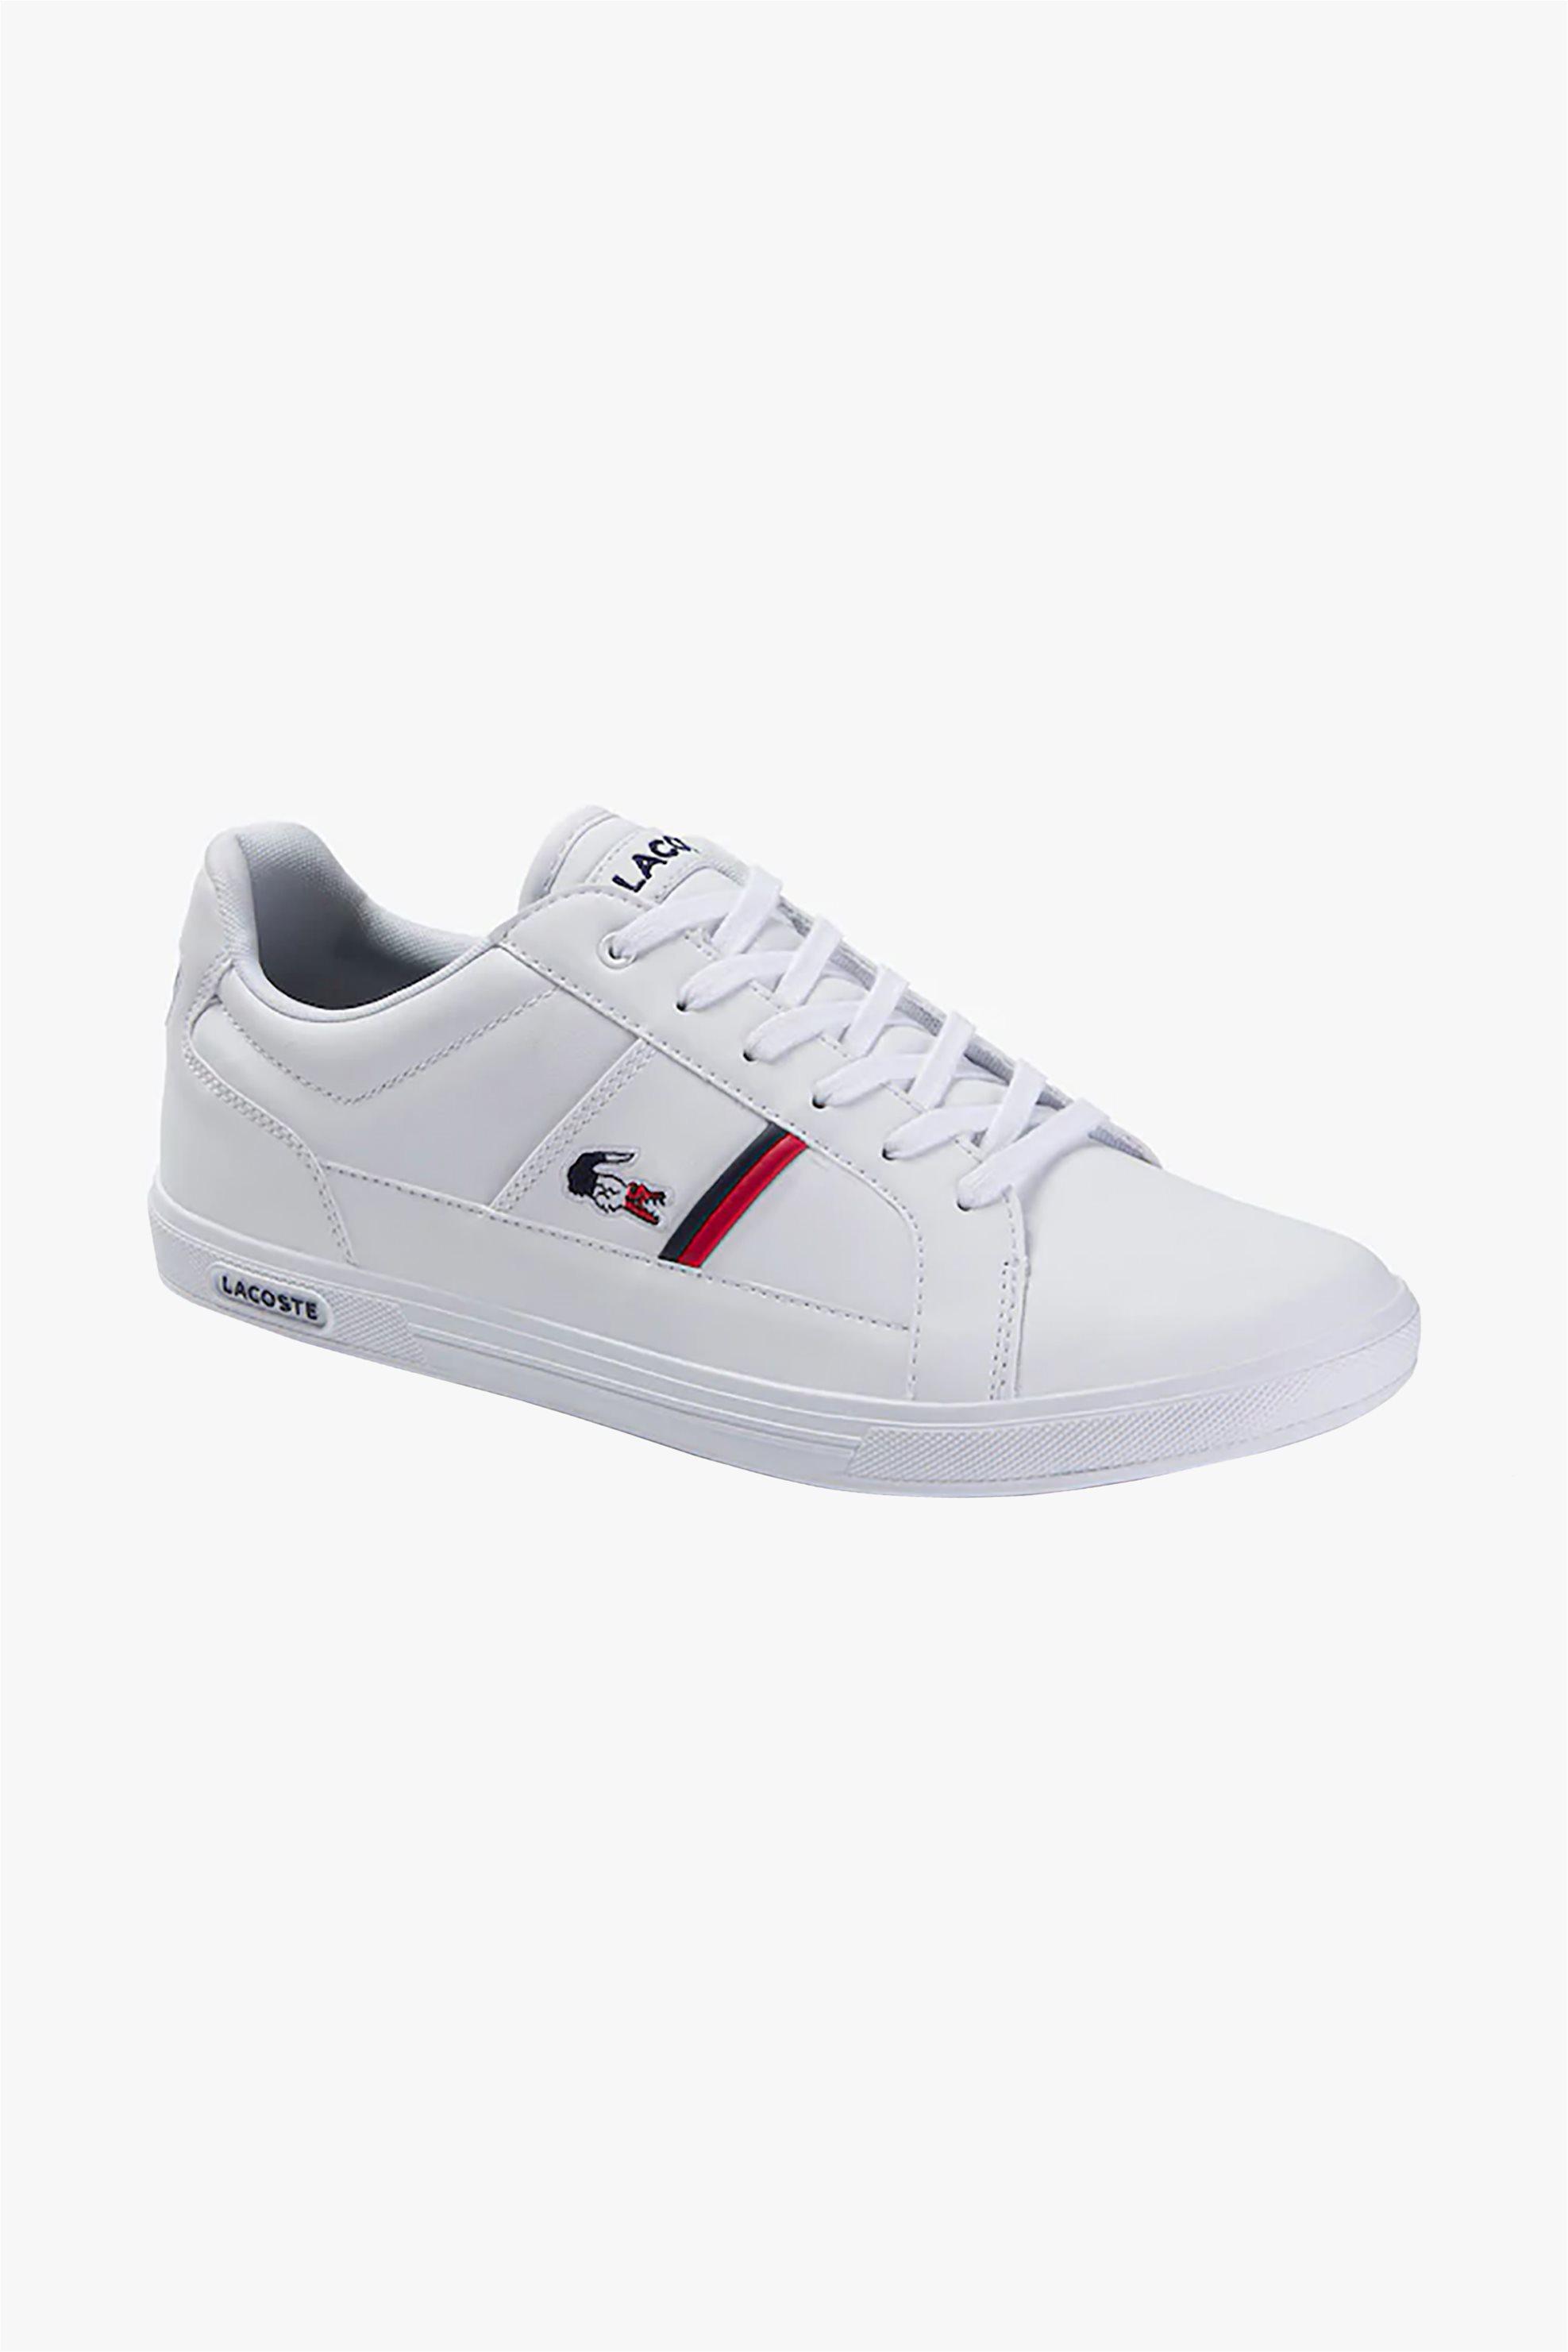 "Lacoste ανδρικά sneakers ""Europa Tricolore "" – 39SMA0031407 – Λευκό"